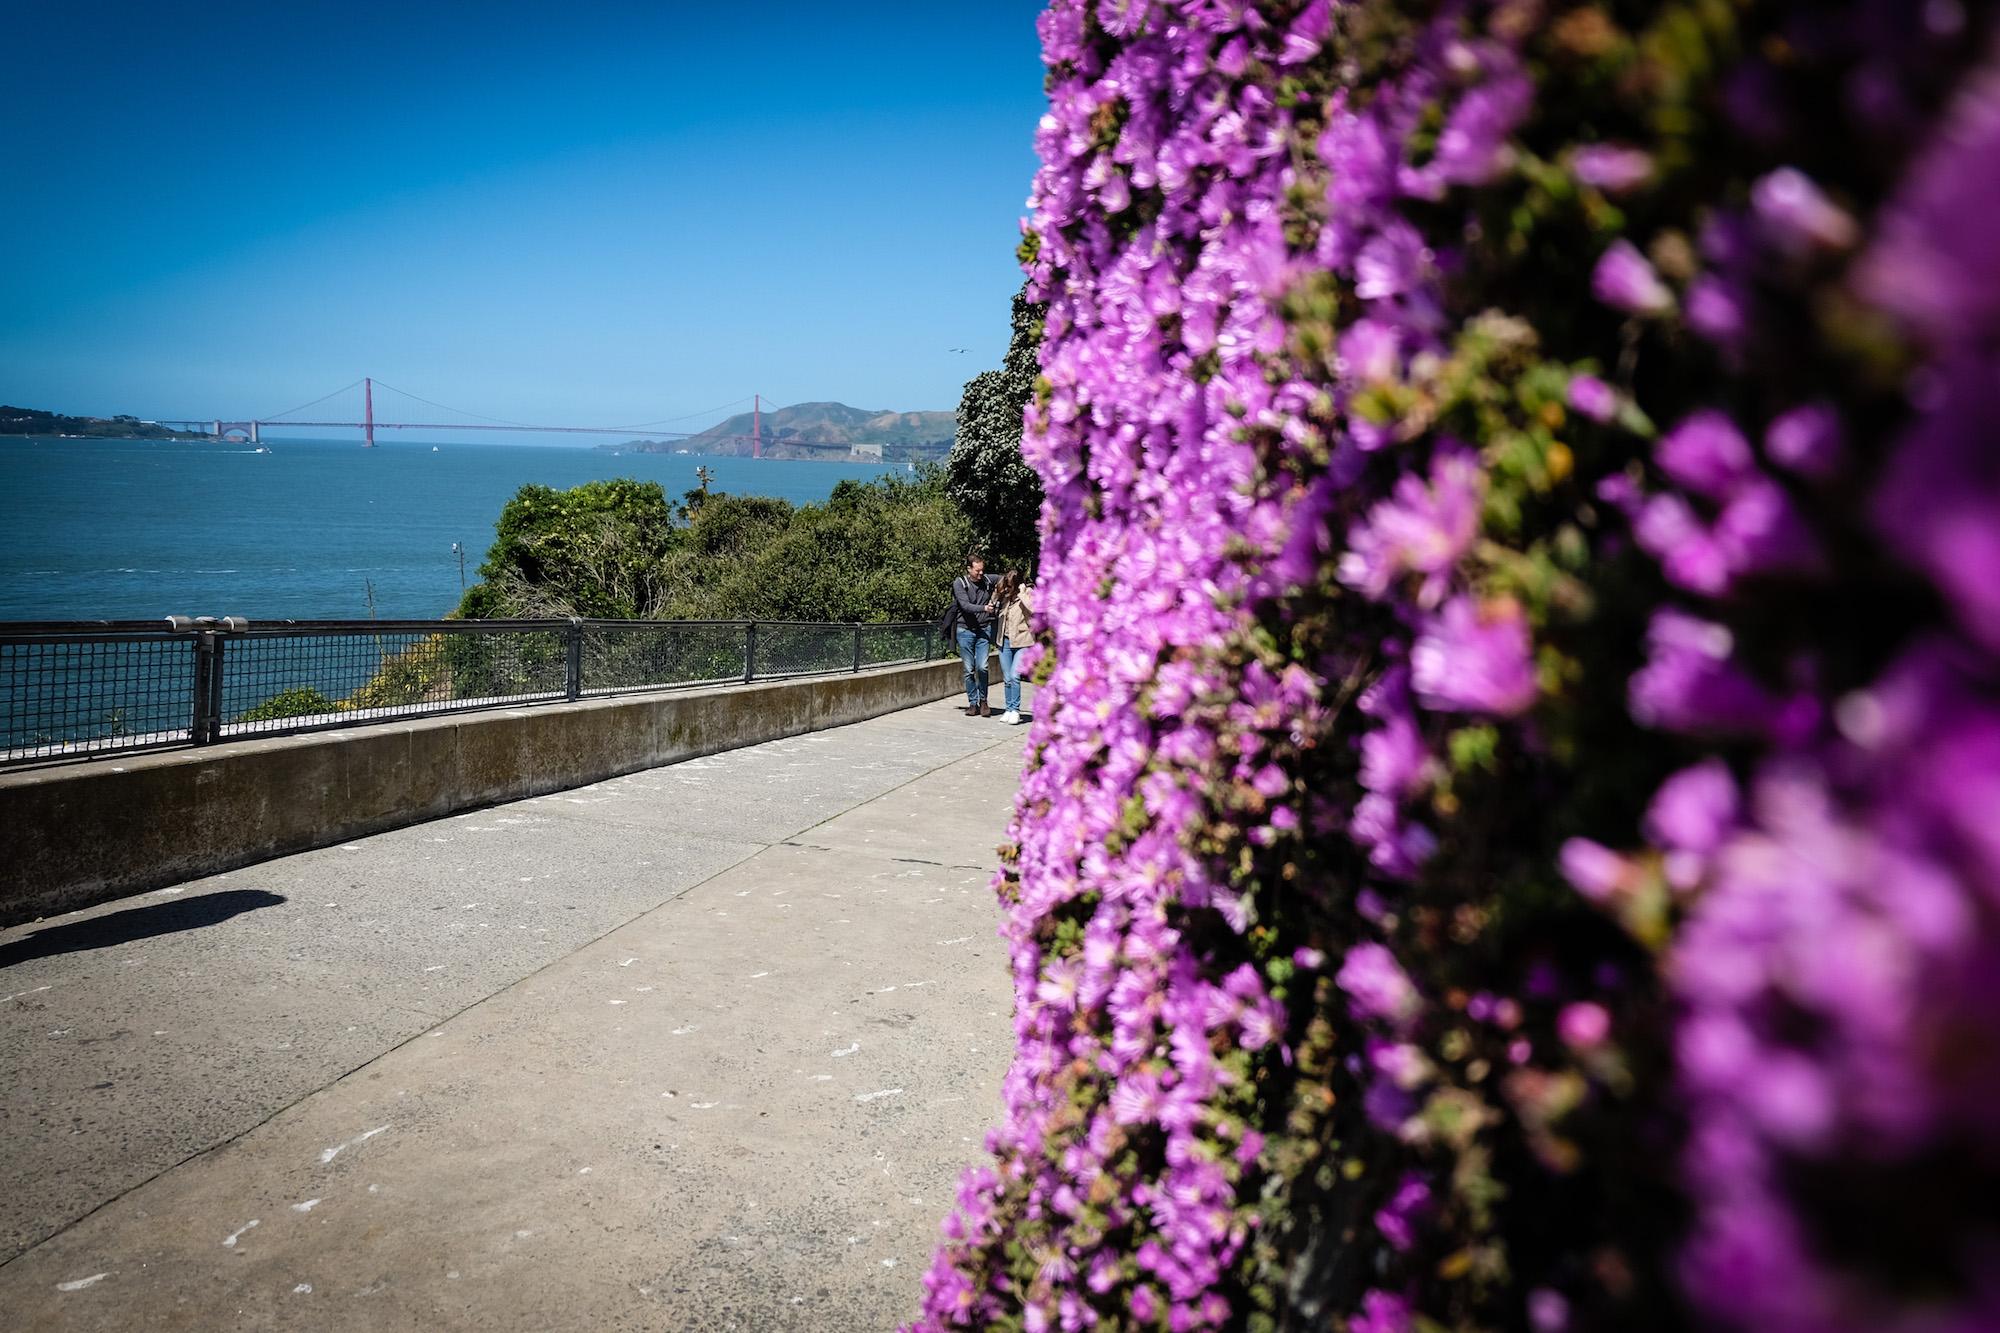 Tourist day at Alcatraz.